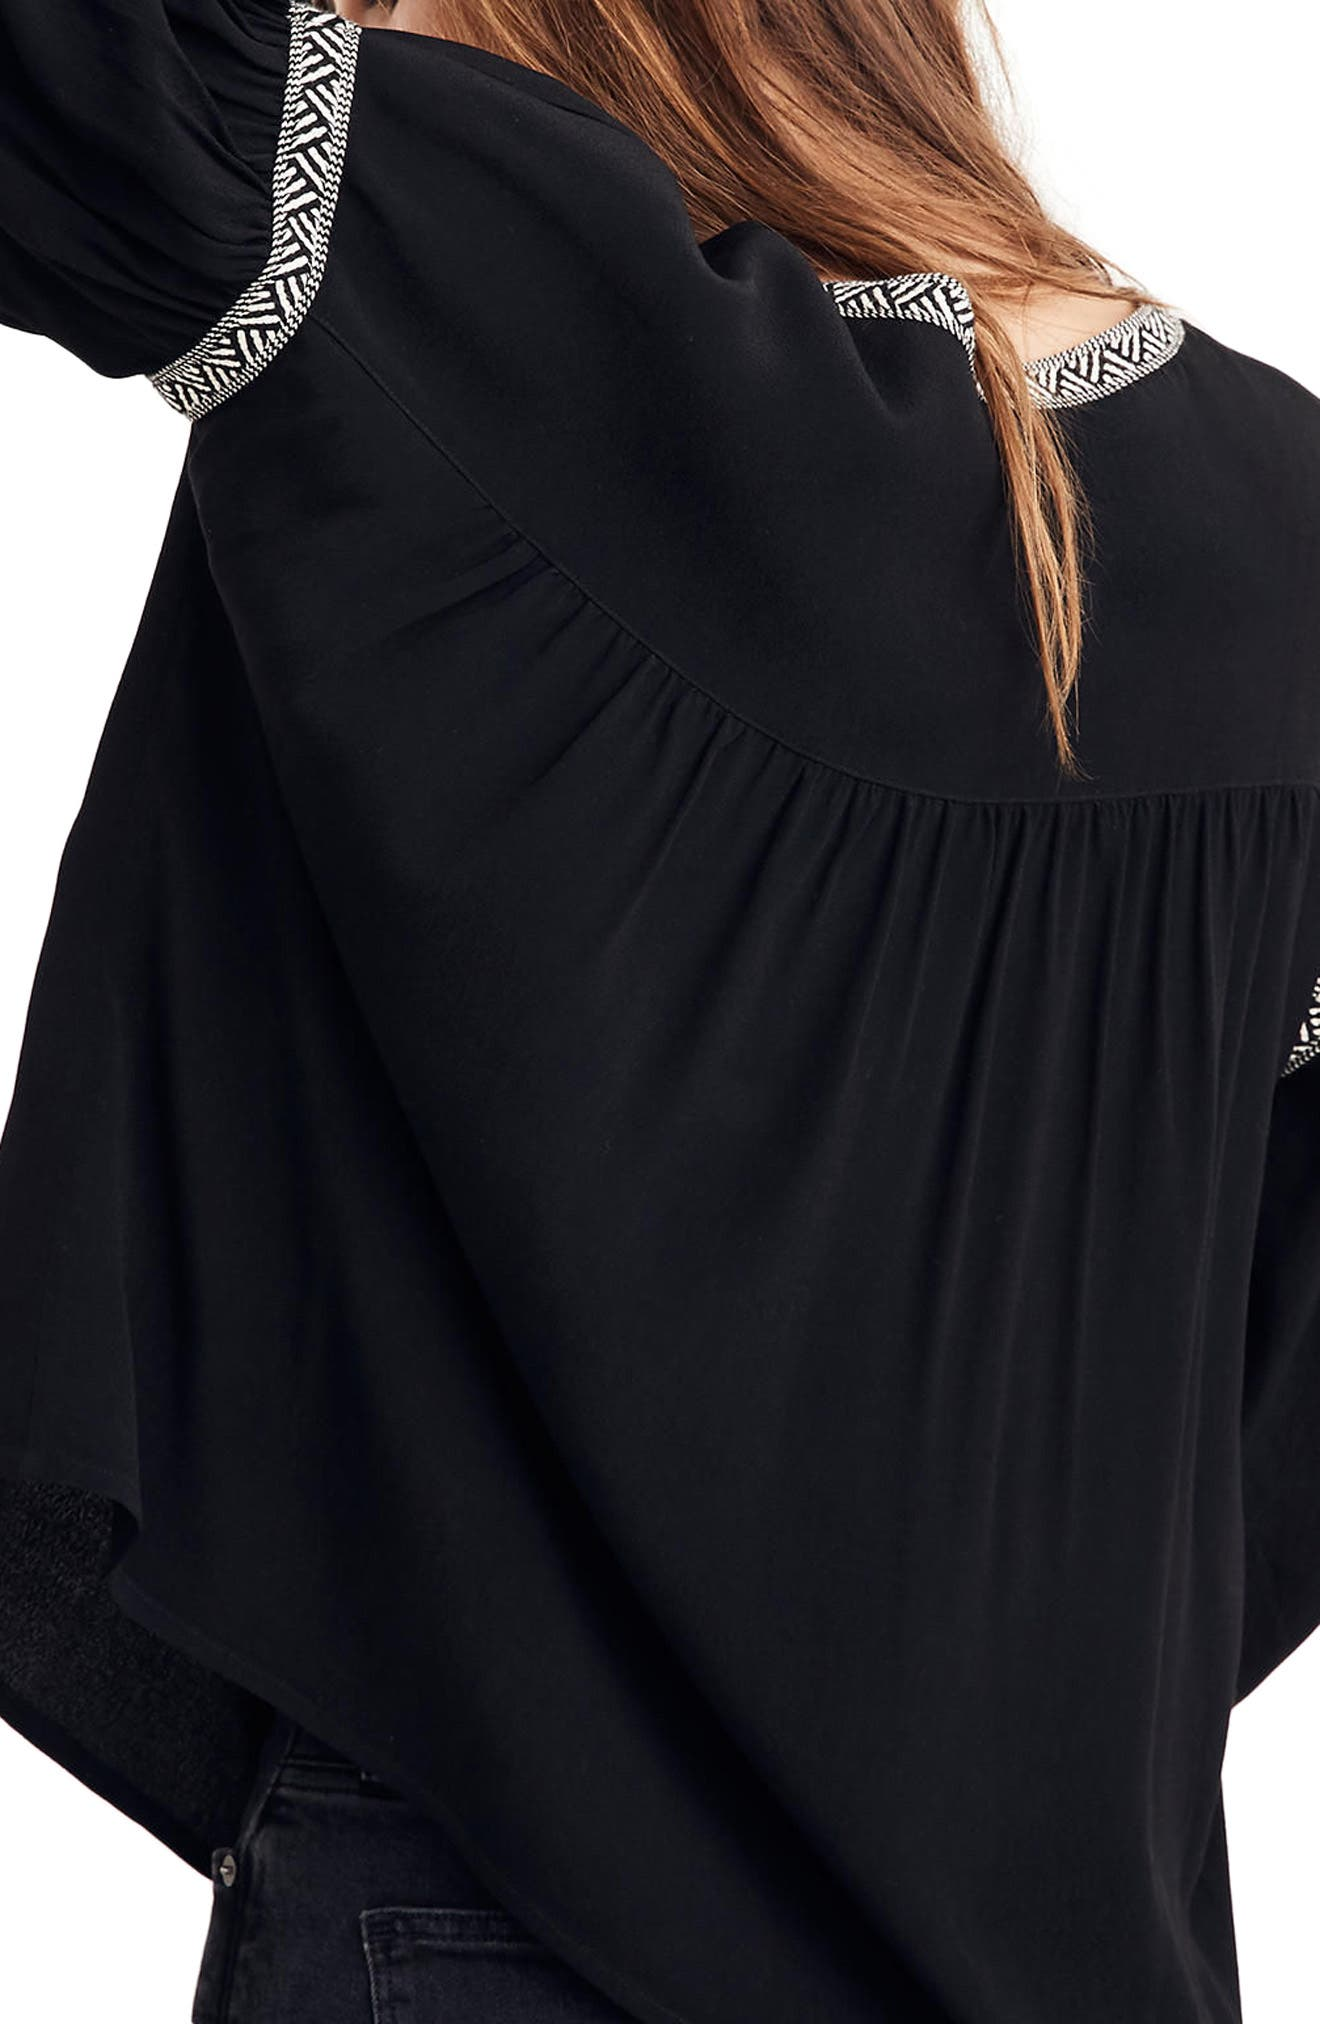 Blouson Sleeve Top,                             Alternate thumbnail 2, color,                             True Black